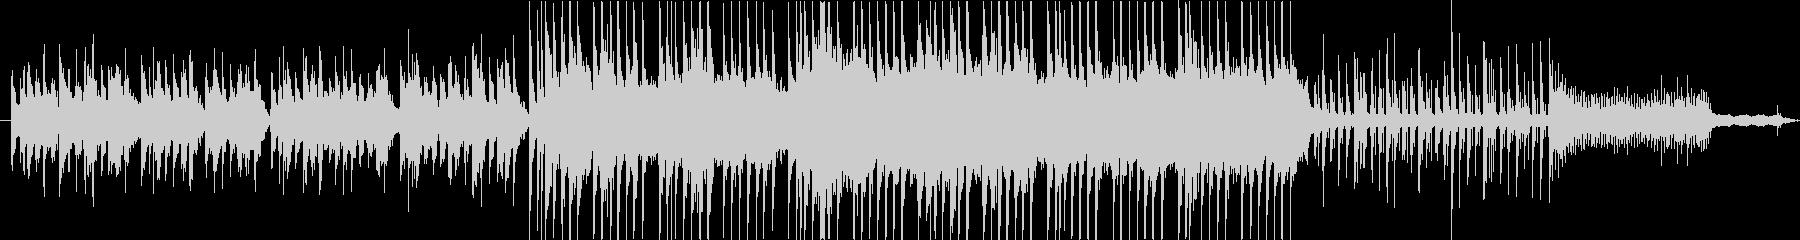 Puntroの未再生の波形